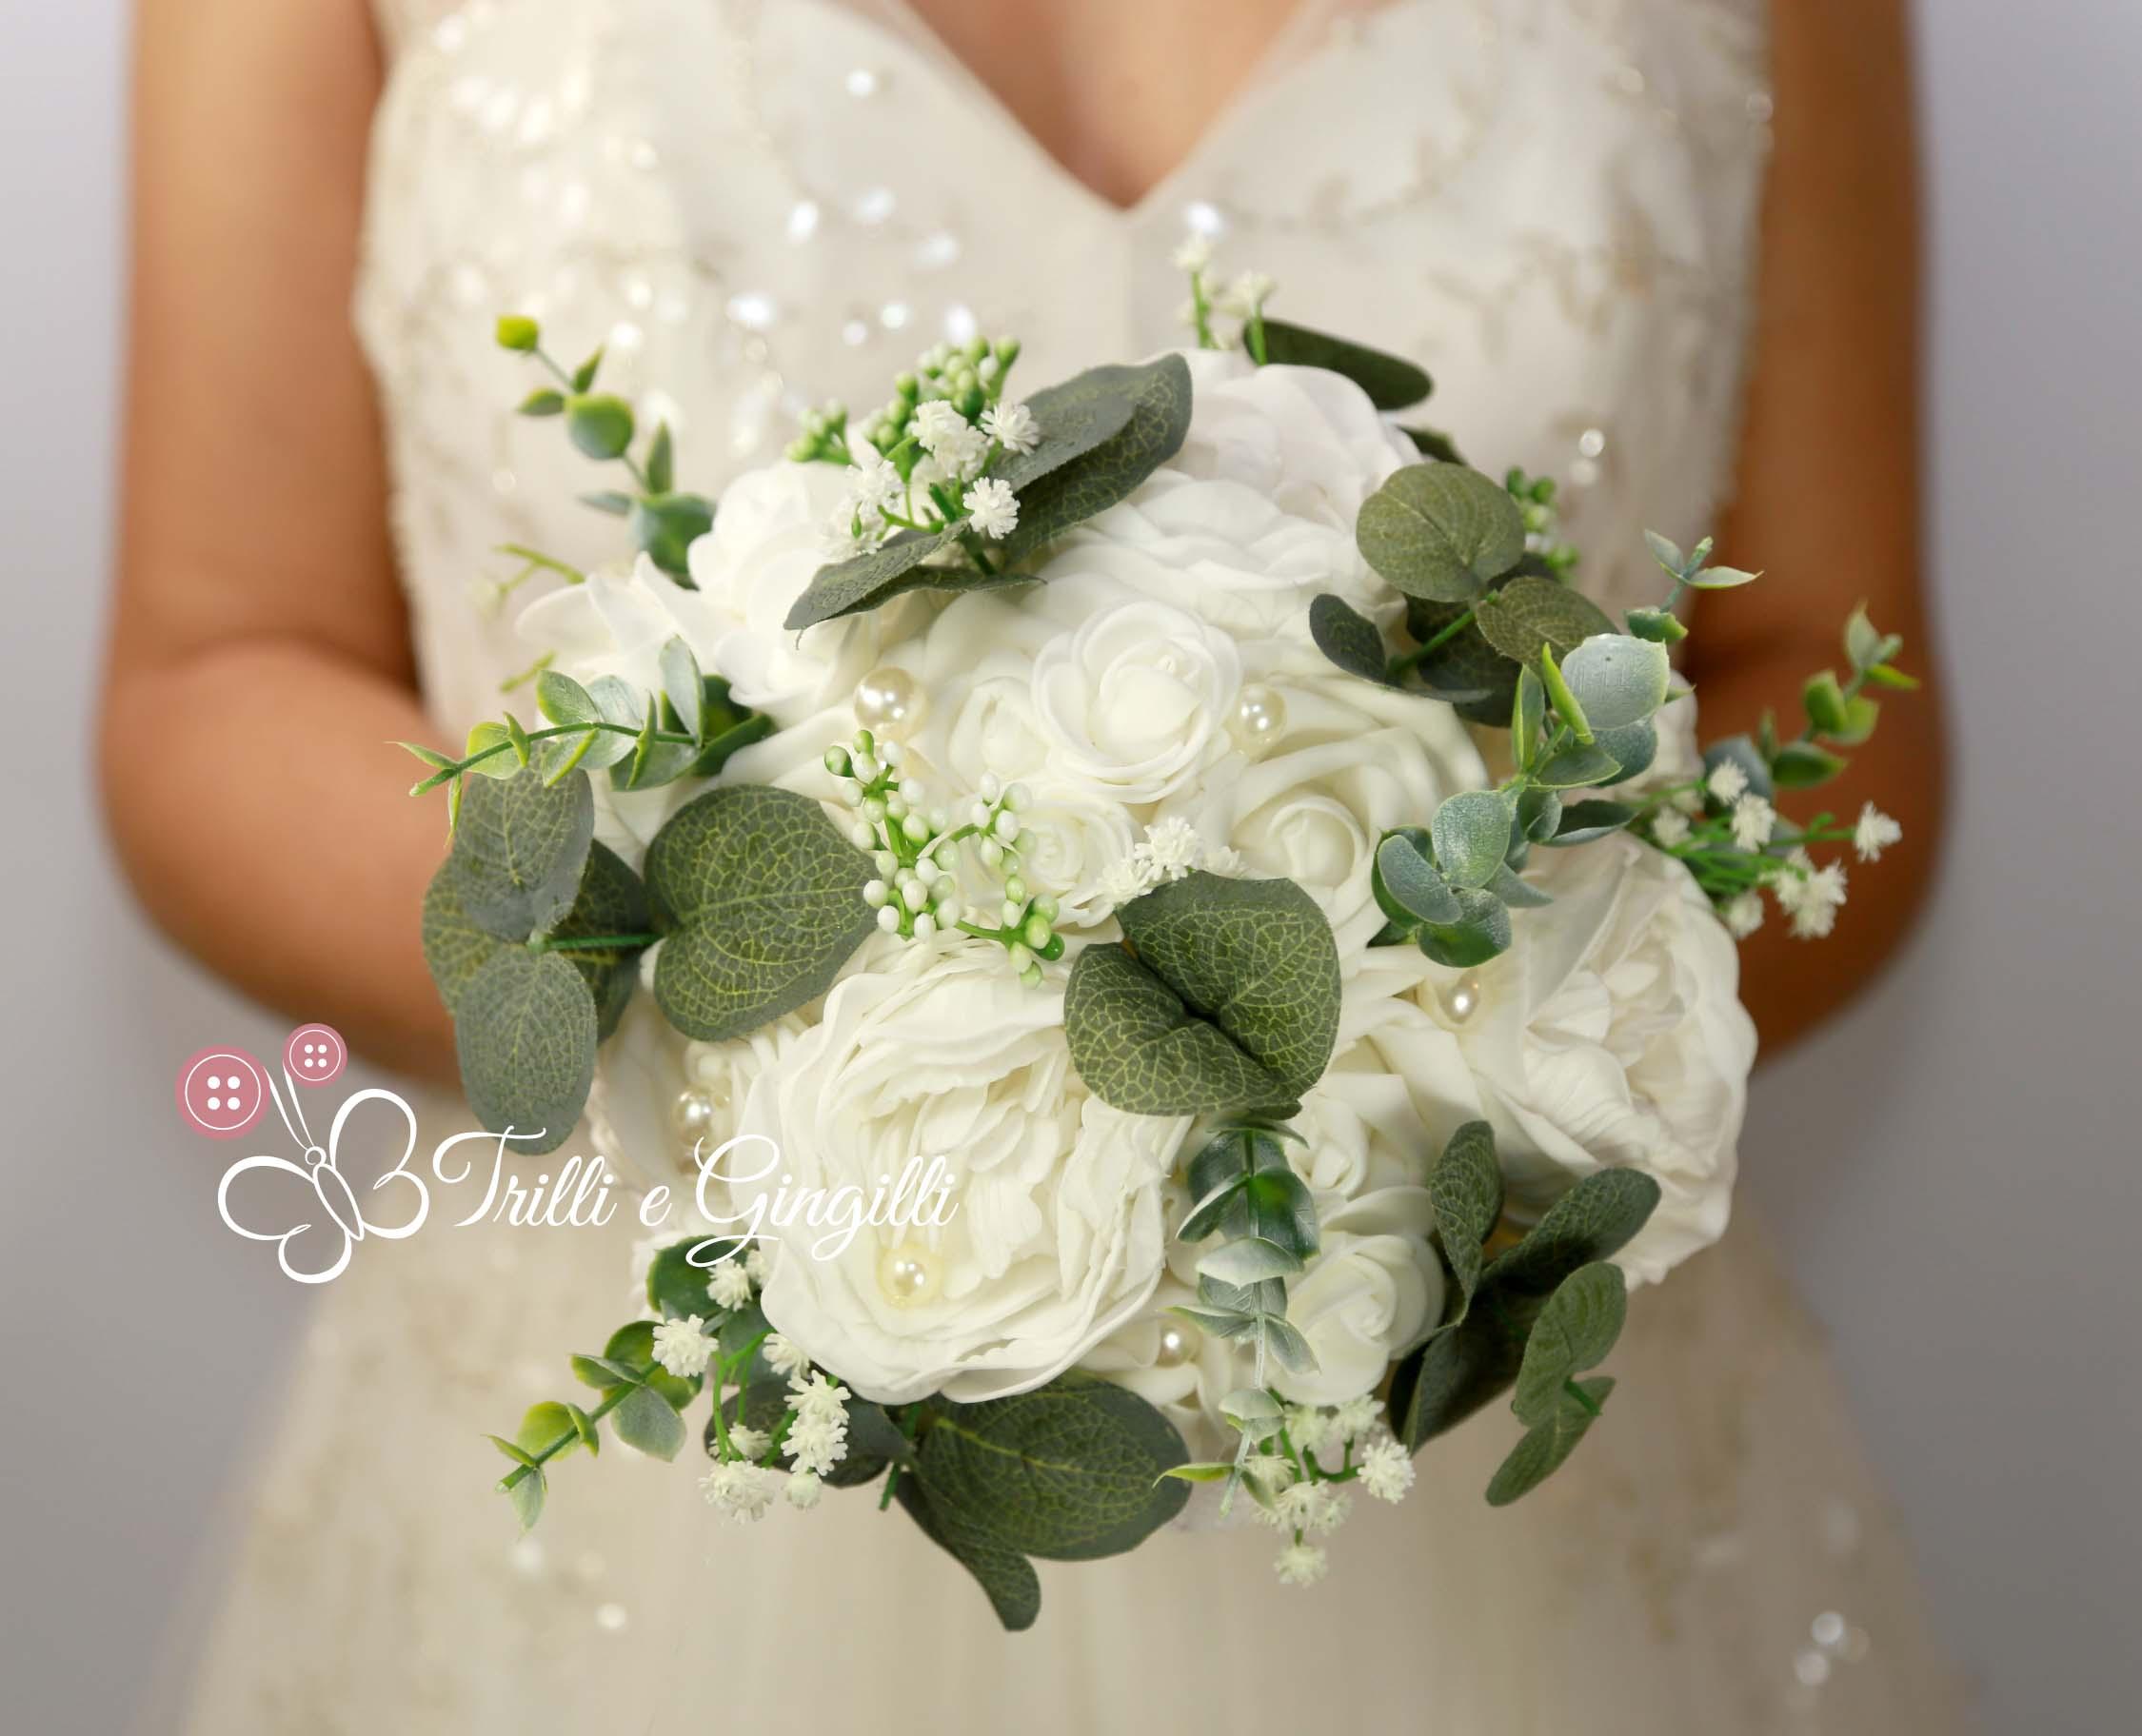 Preferenza Bouquet di rose e peonie, bianco e verde - Trilli e Gingilli NN69